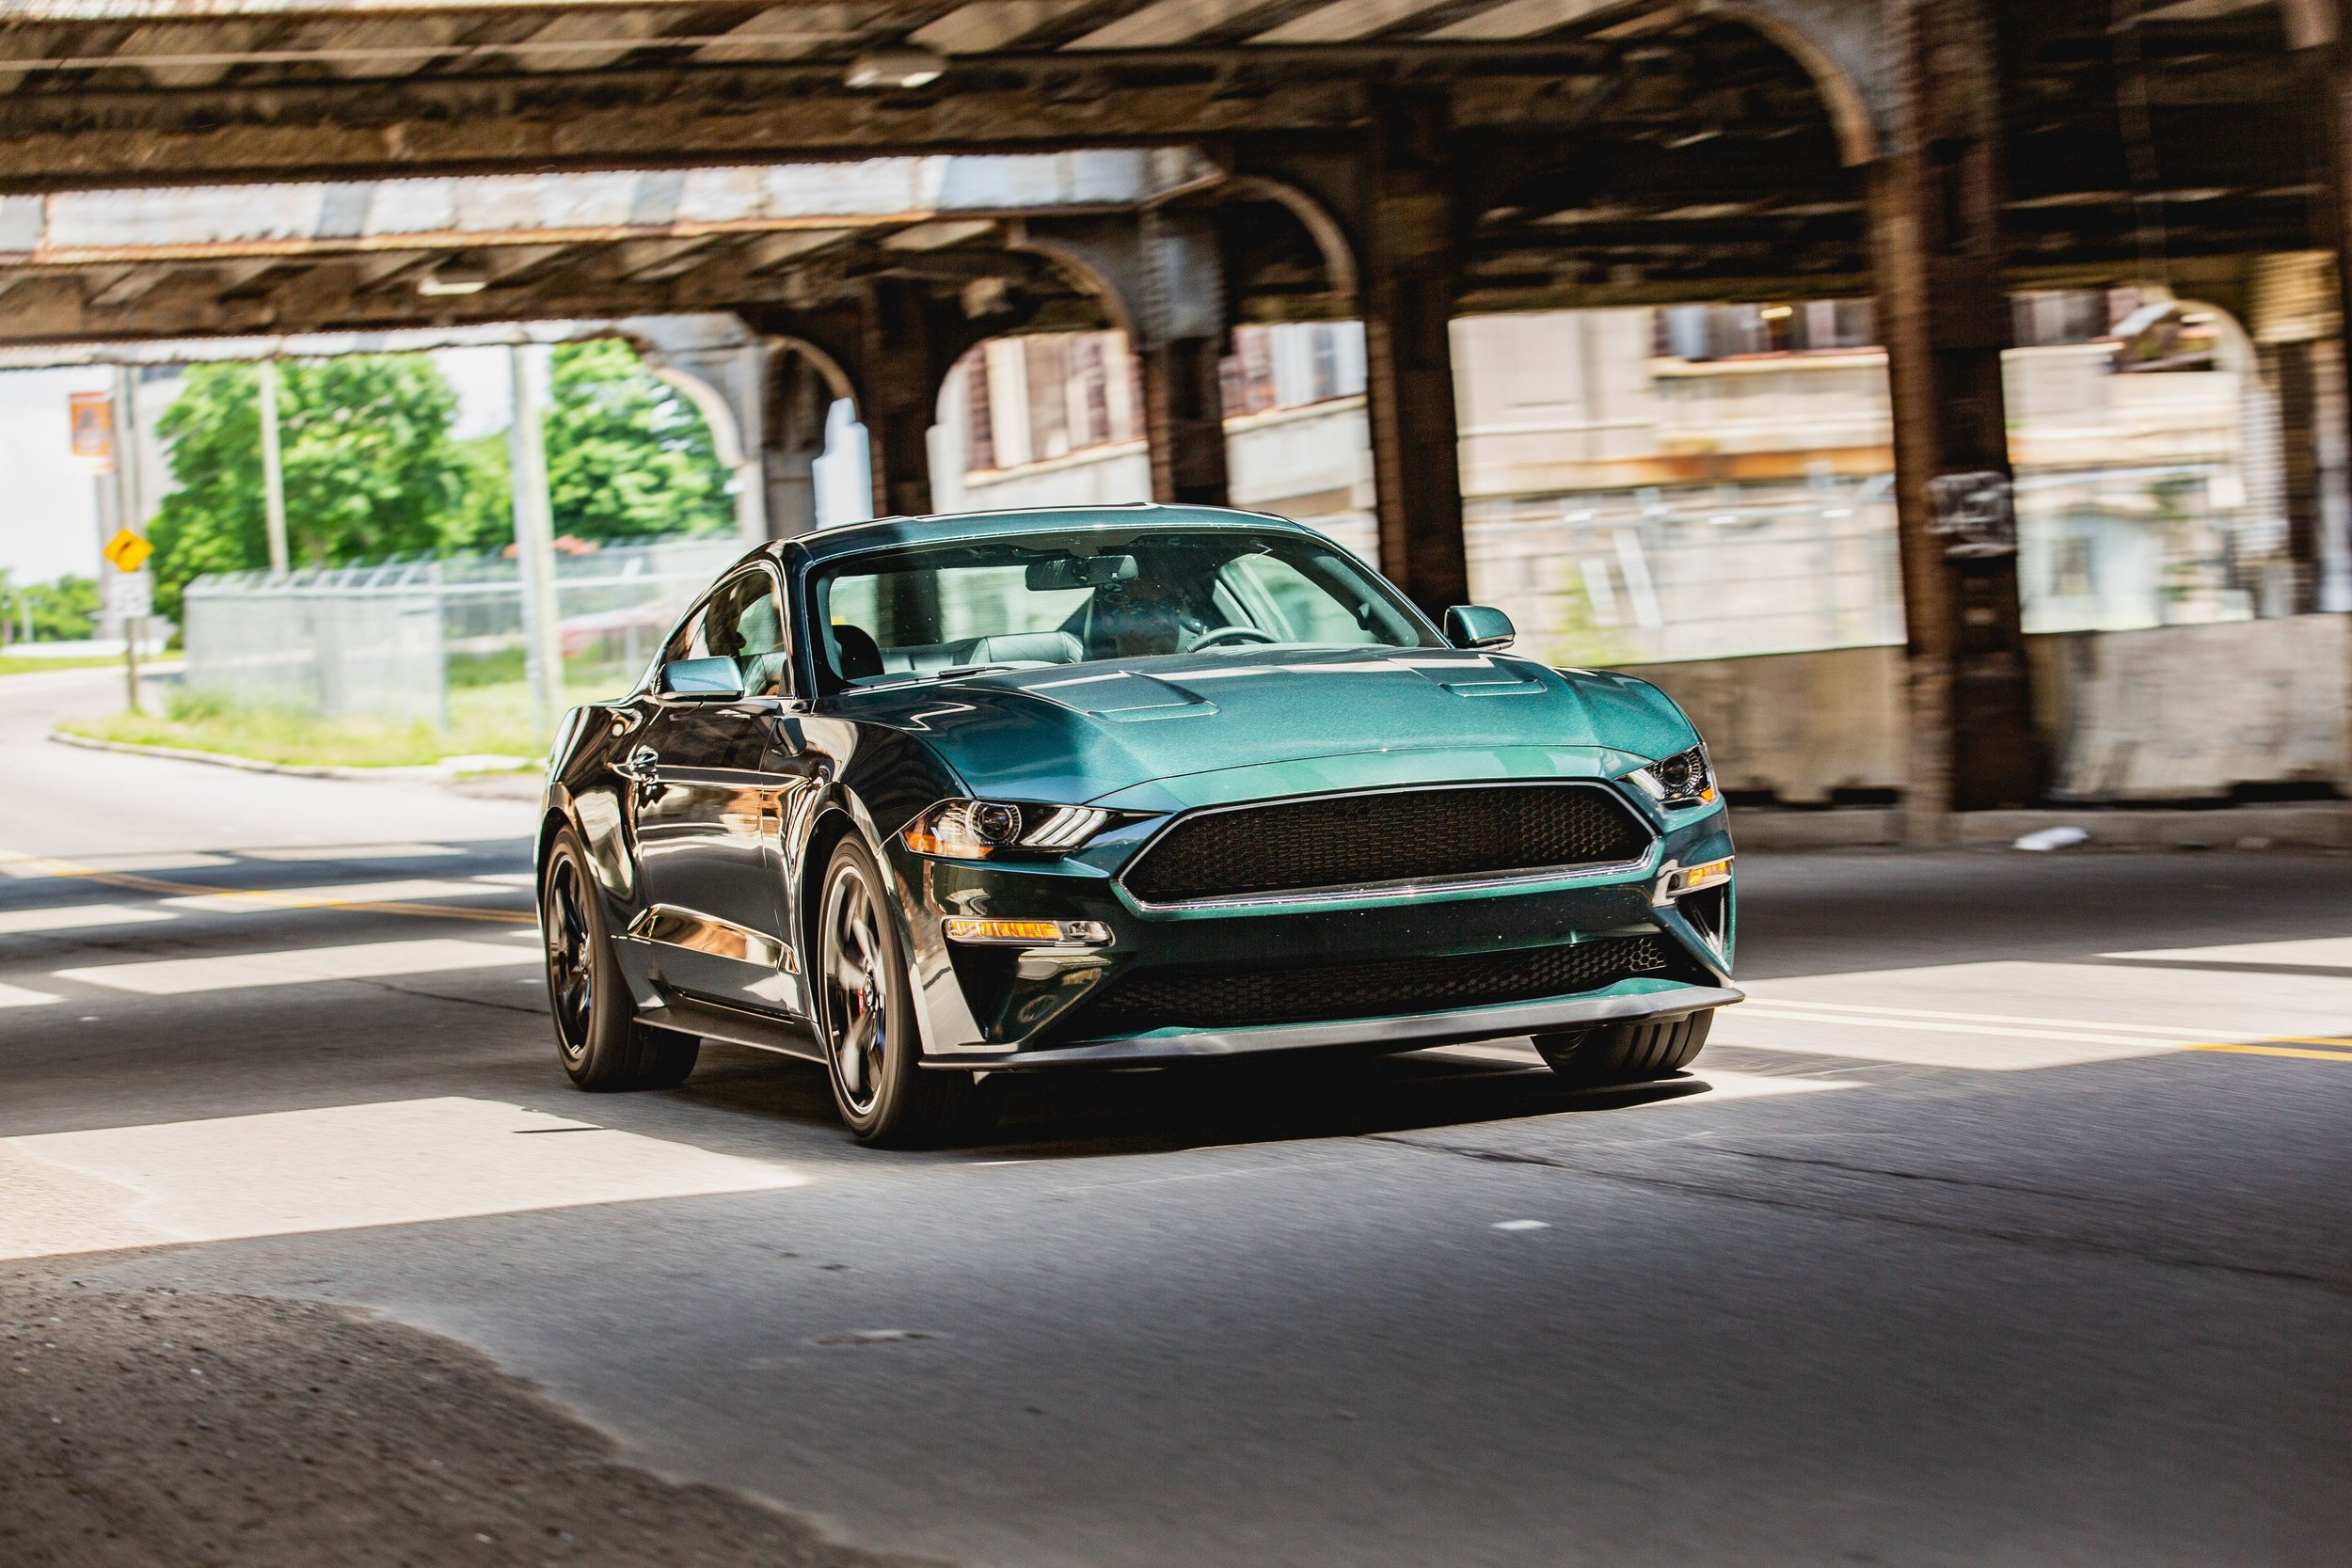 2019-ford-mustang-bullitt-long-term-road-test-brad-fick-car-and-driver.jpg